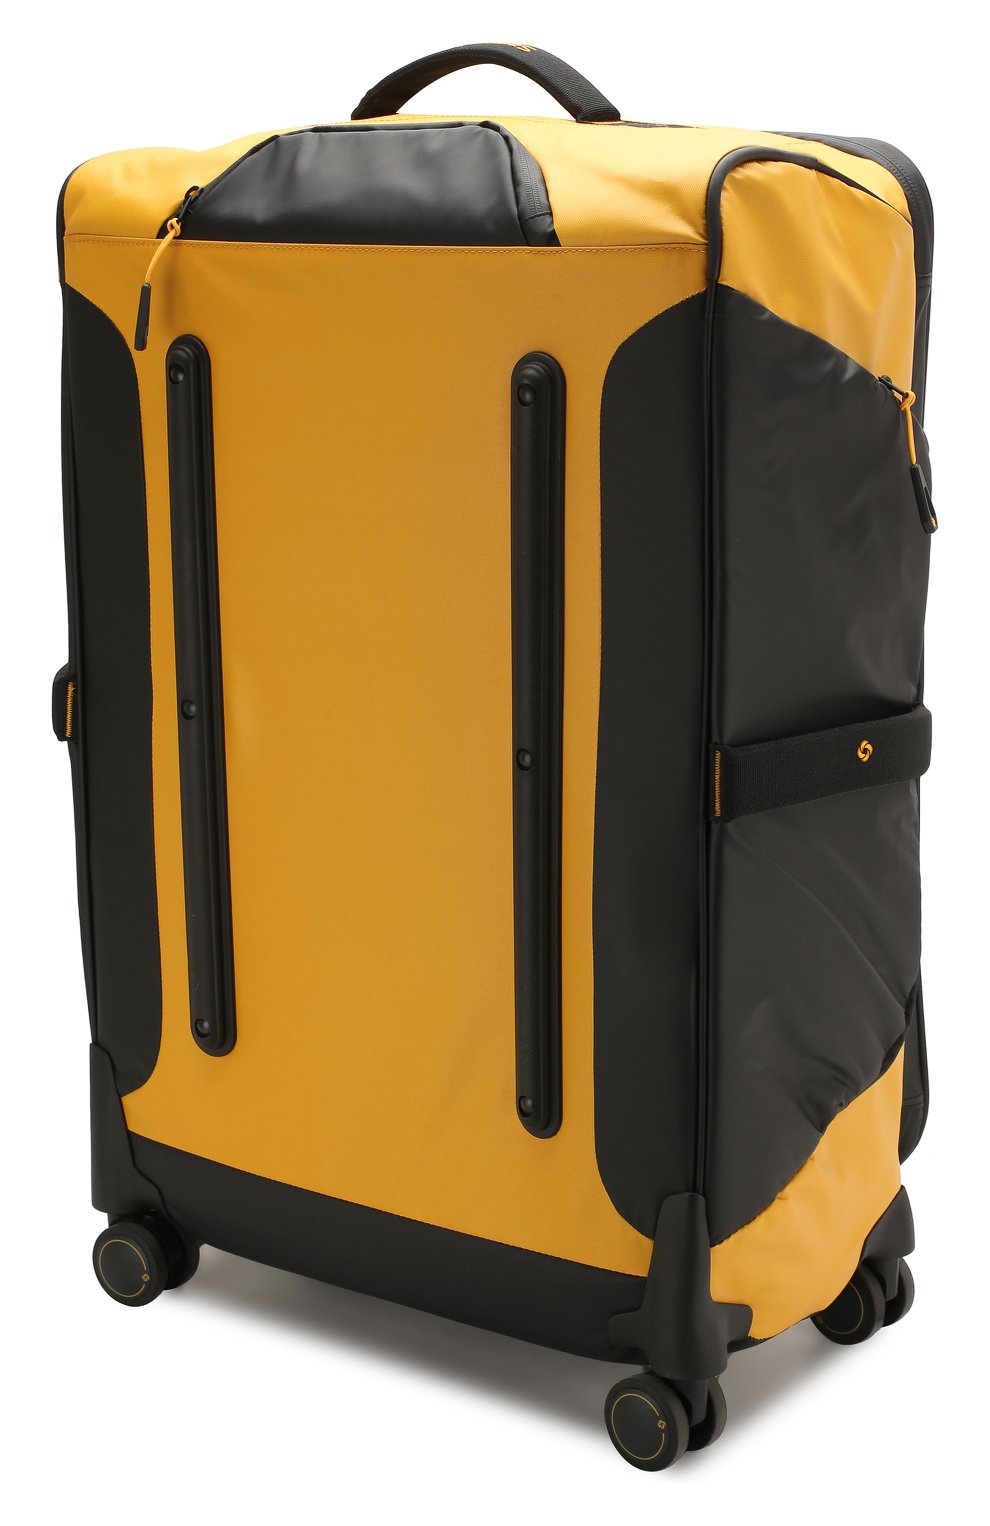 19b80fbaf818 Мужской желтый дорожный чемодан paradiver light medium SAMSONITE ...